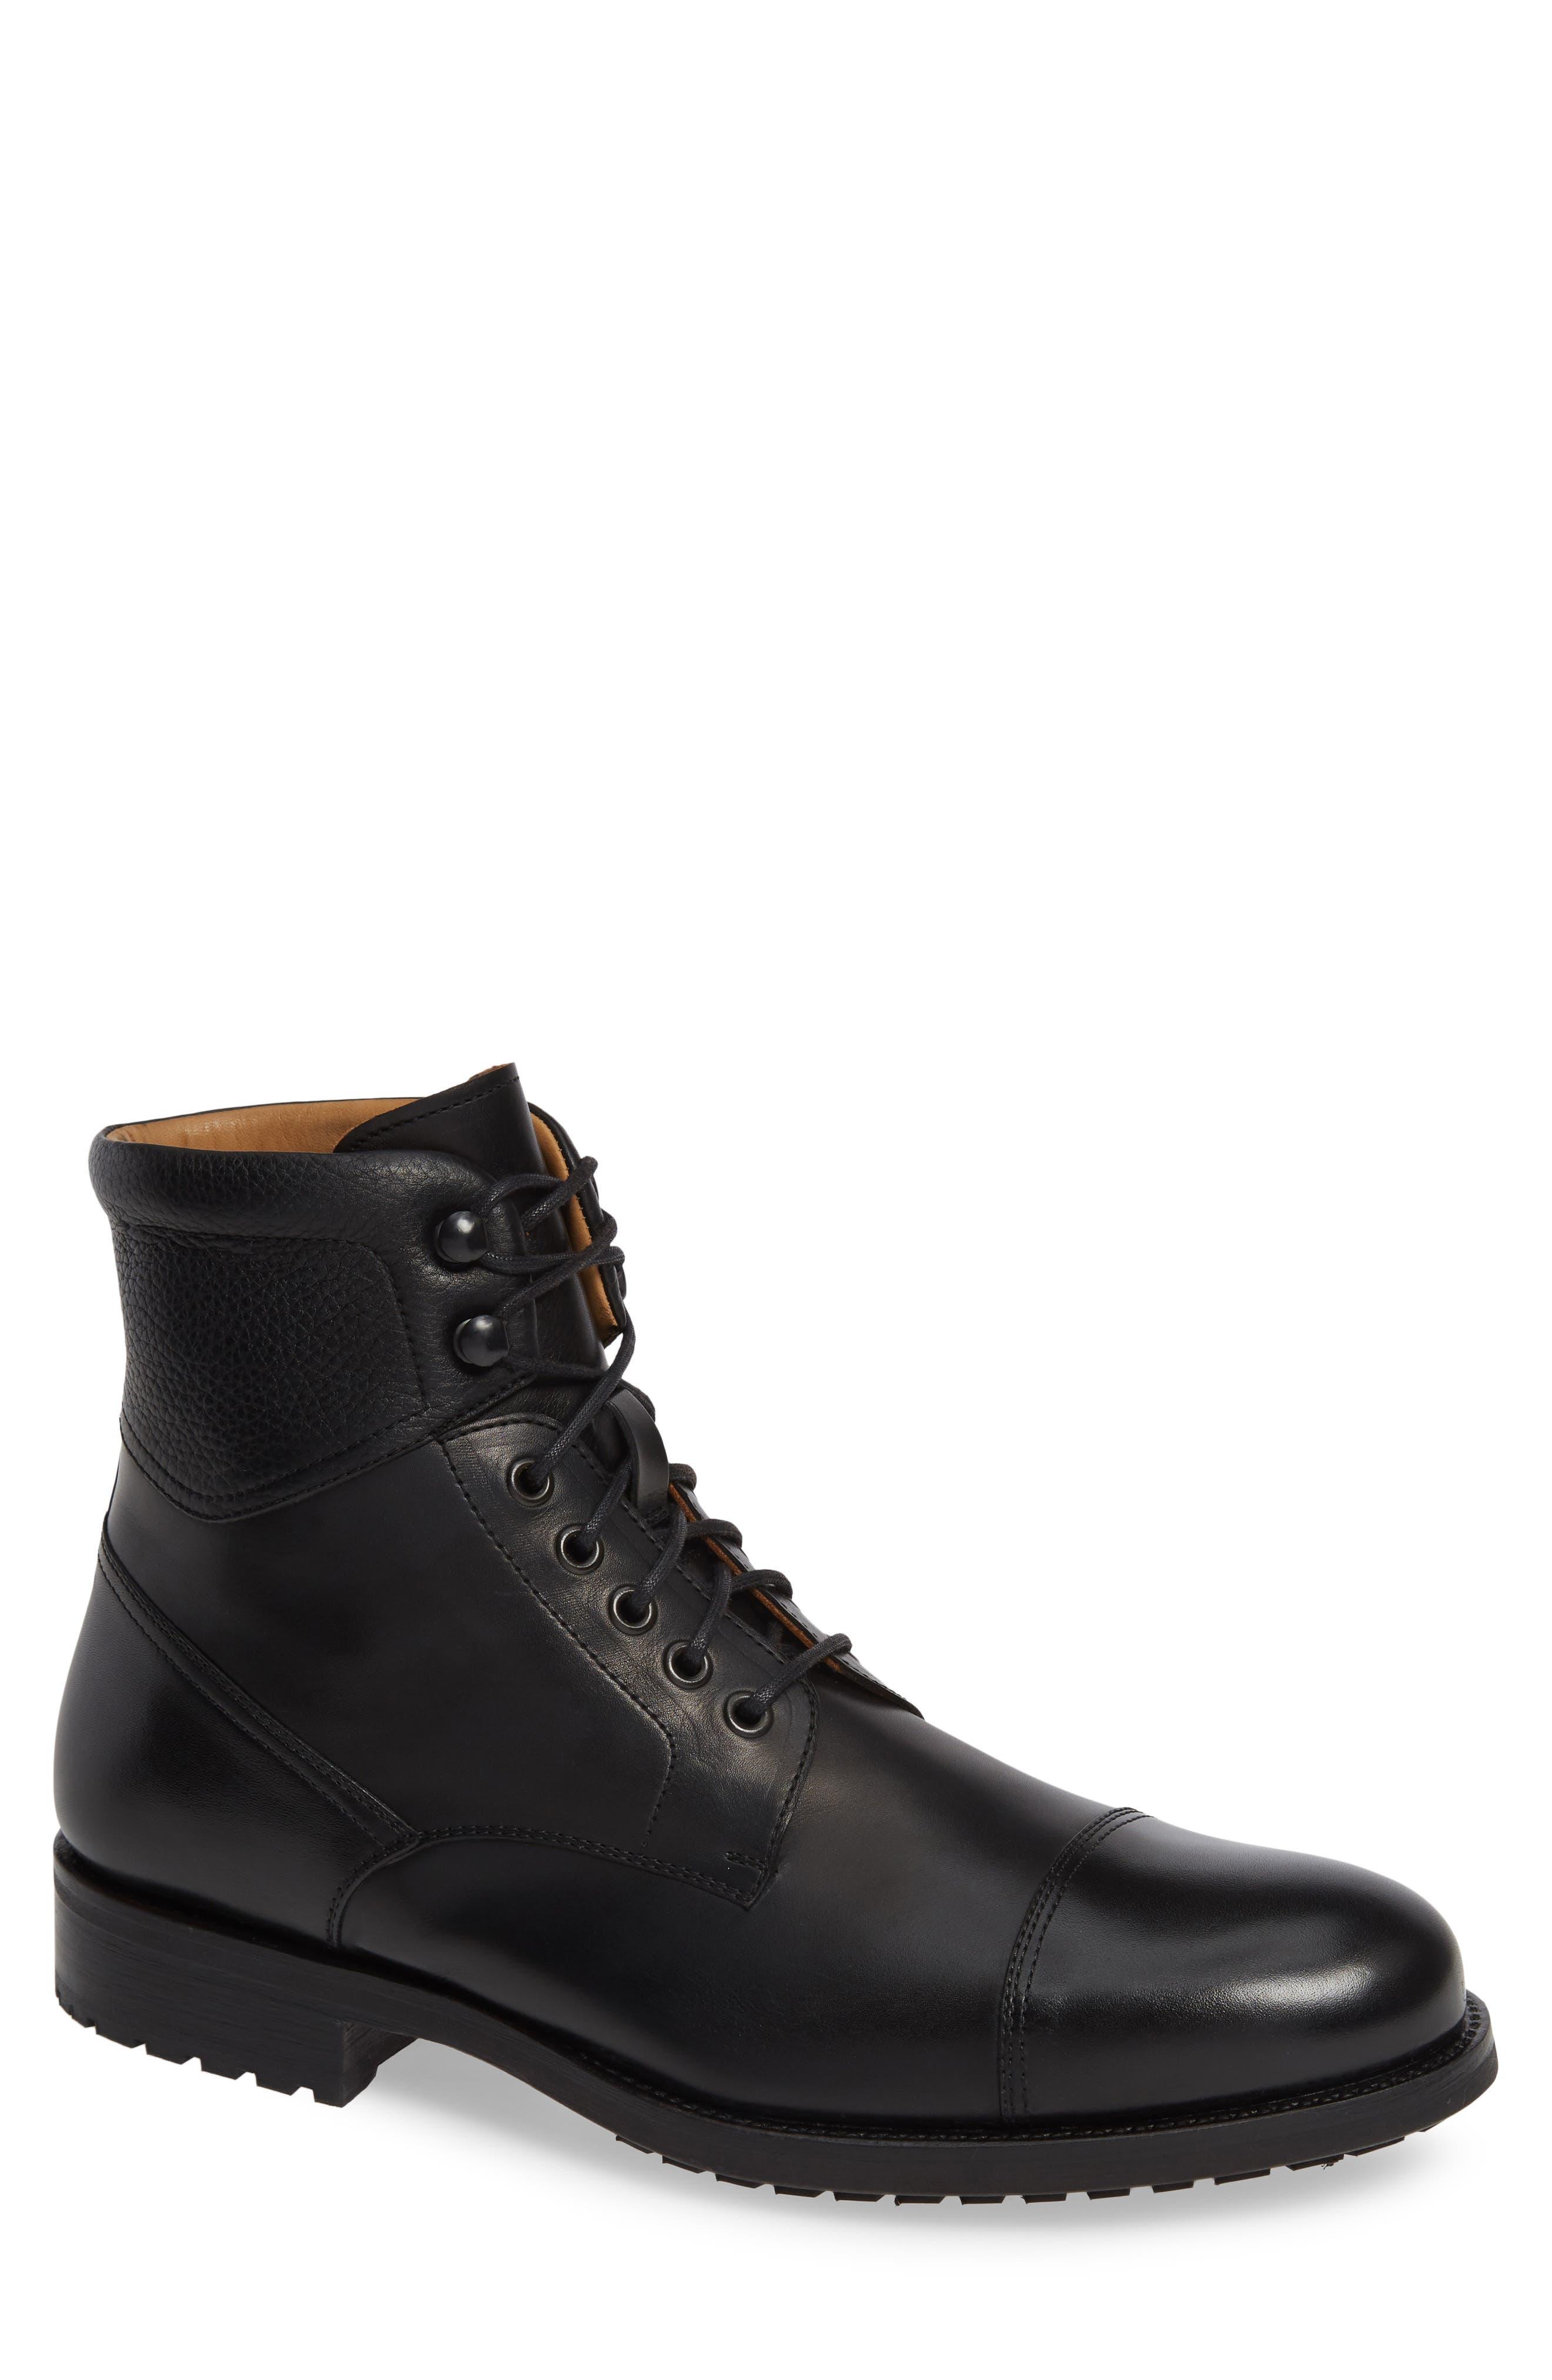 Peyton Cap Toe Boot,                         Main,                         color, BLACK LEATHER